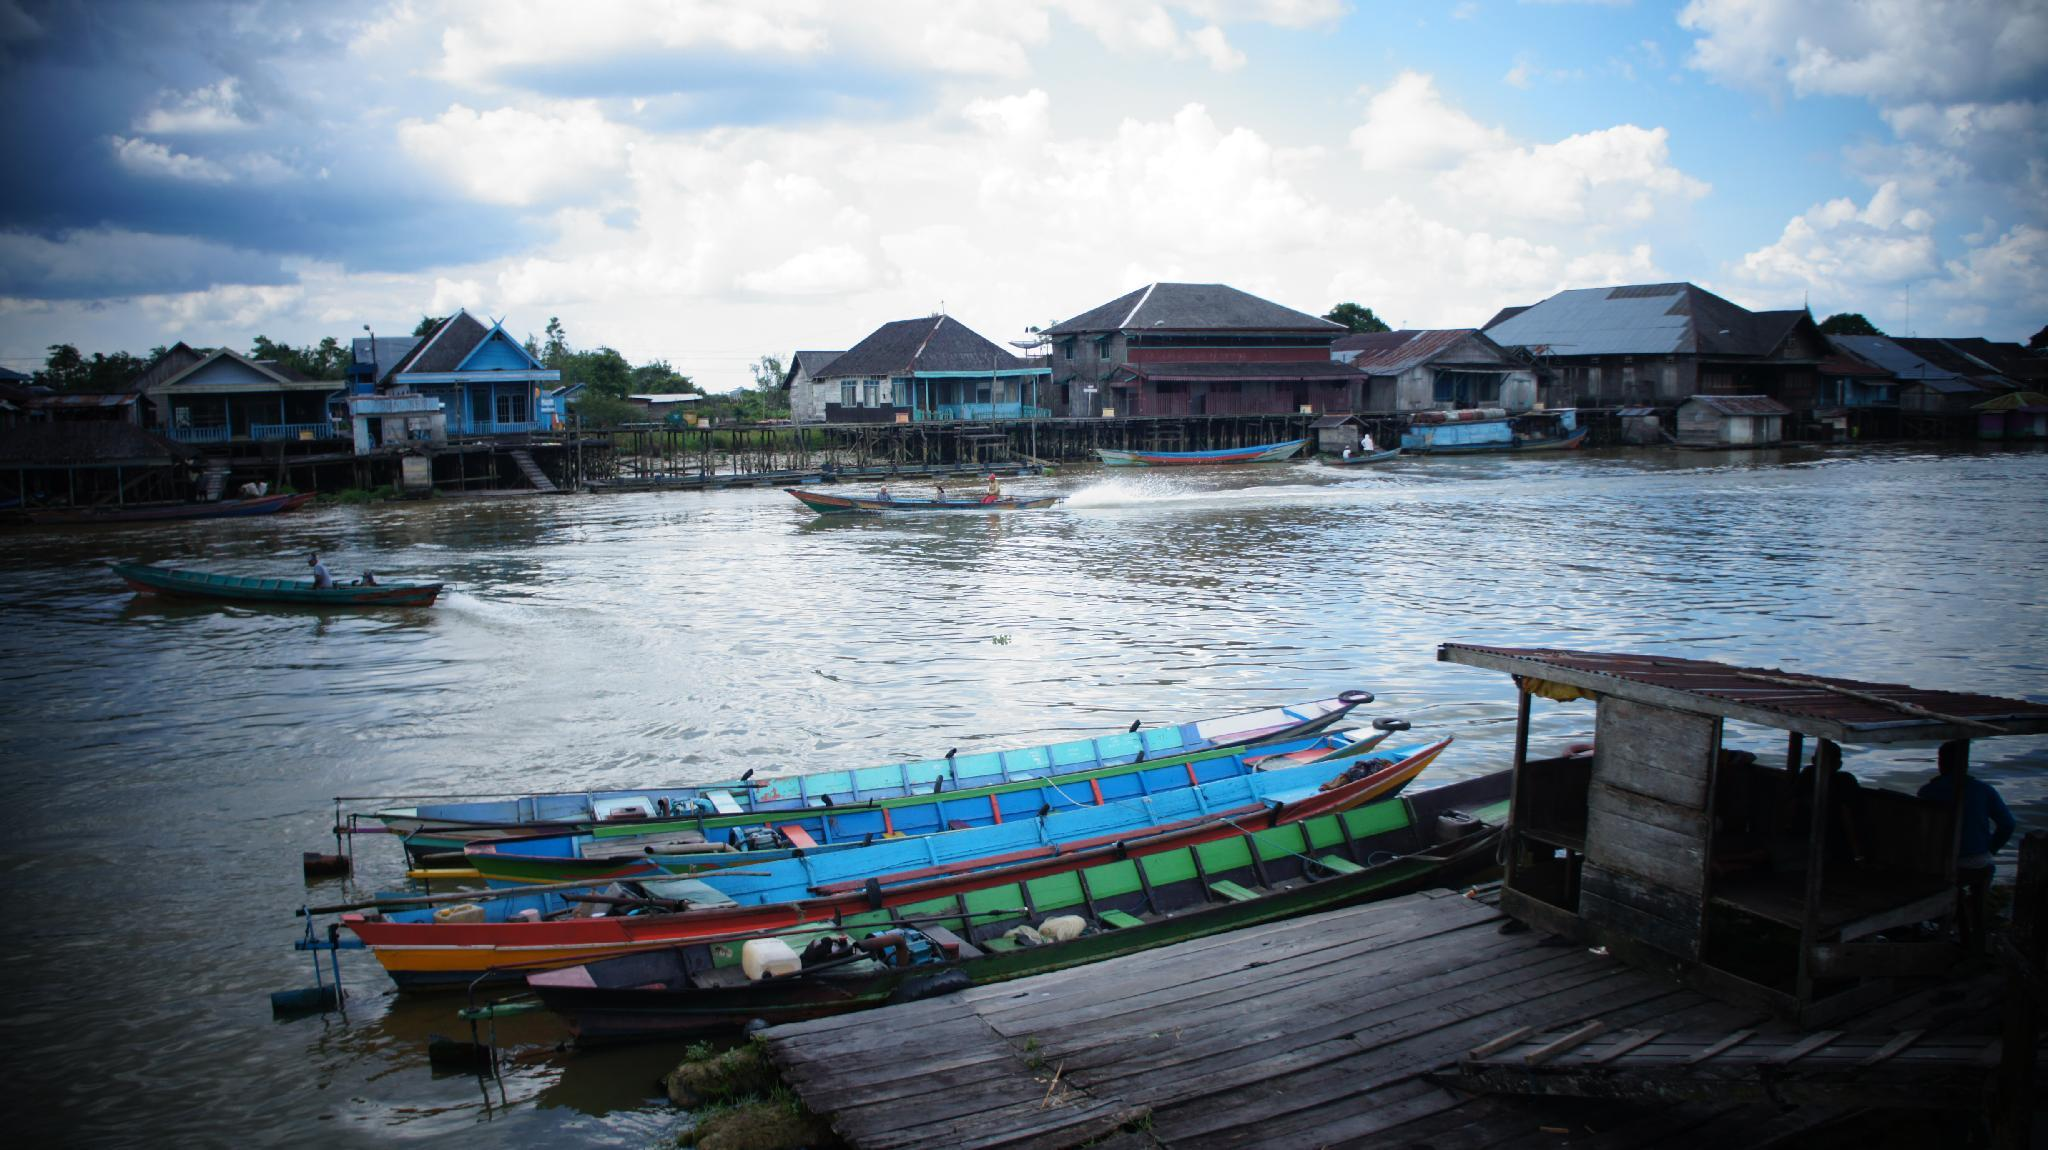 Dayak Traditional Wooden House Riverside